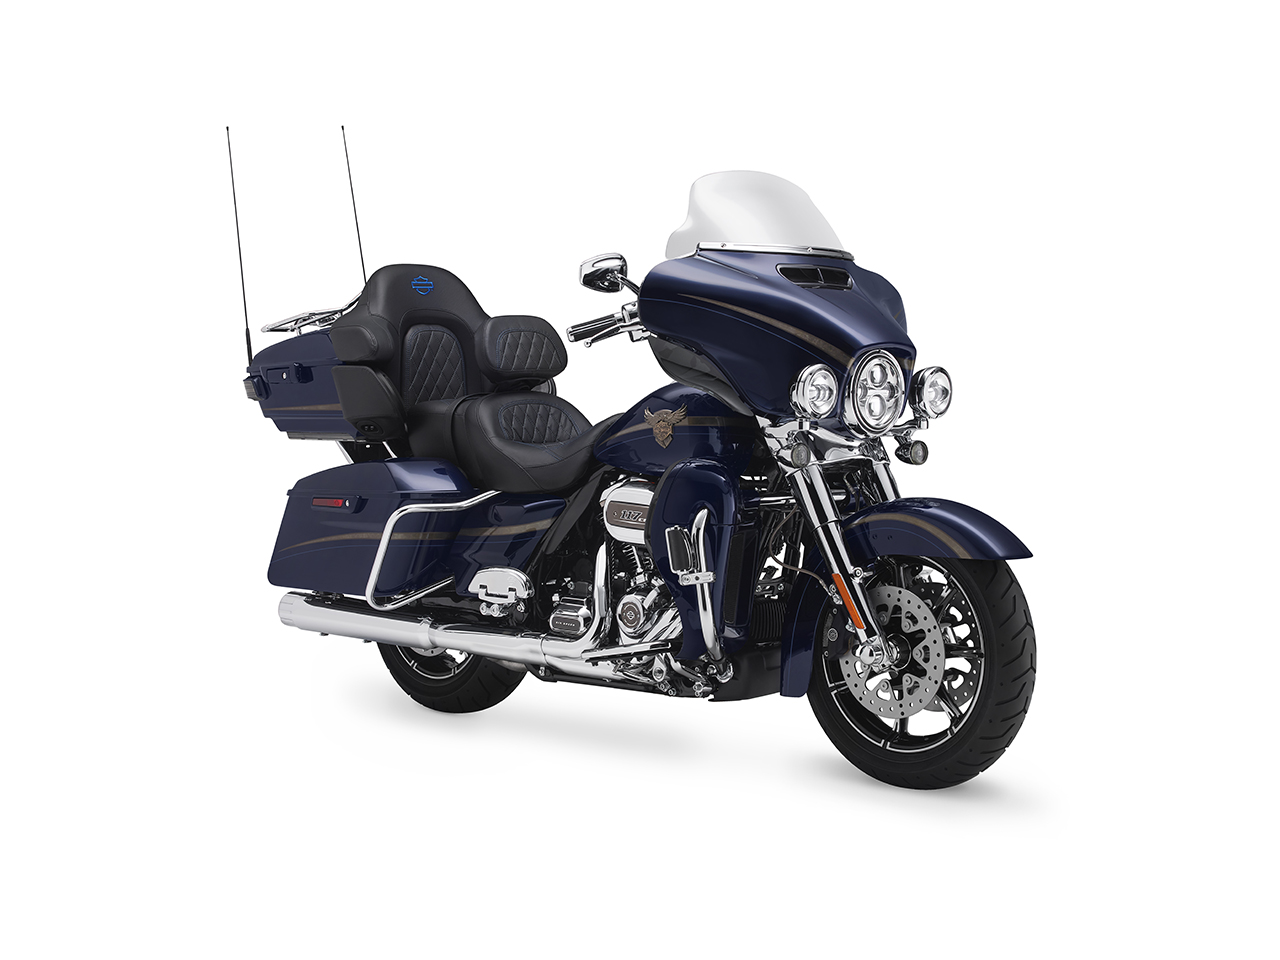 2018 Harley-Davidson CVO Limited Image